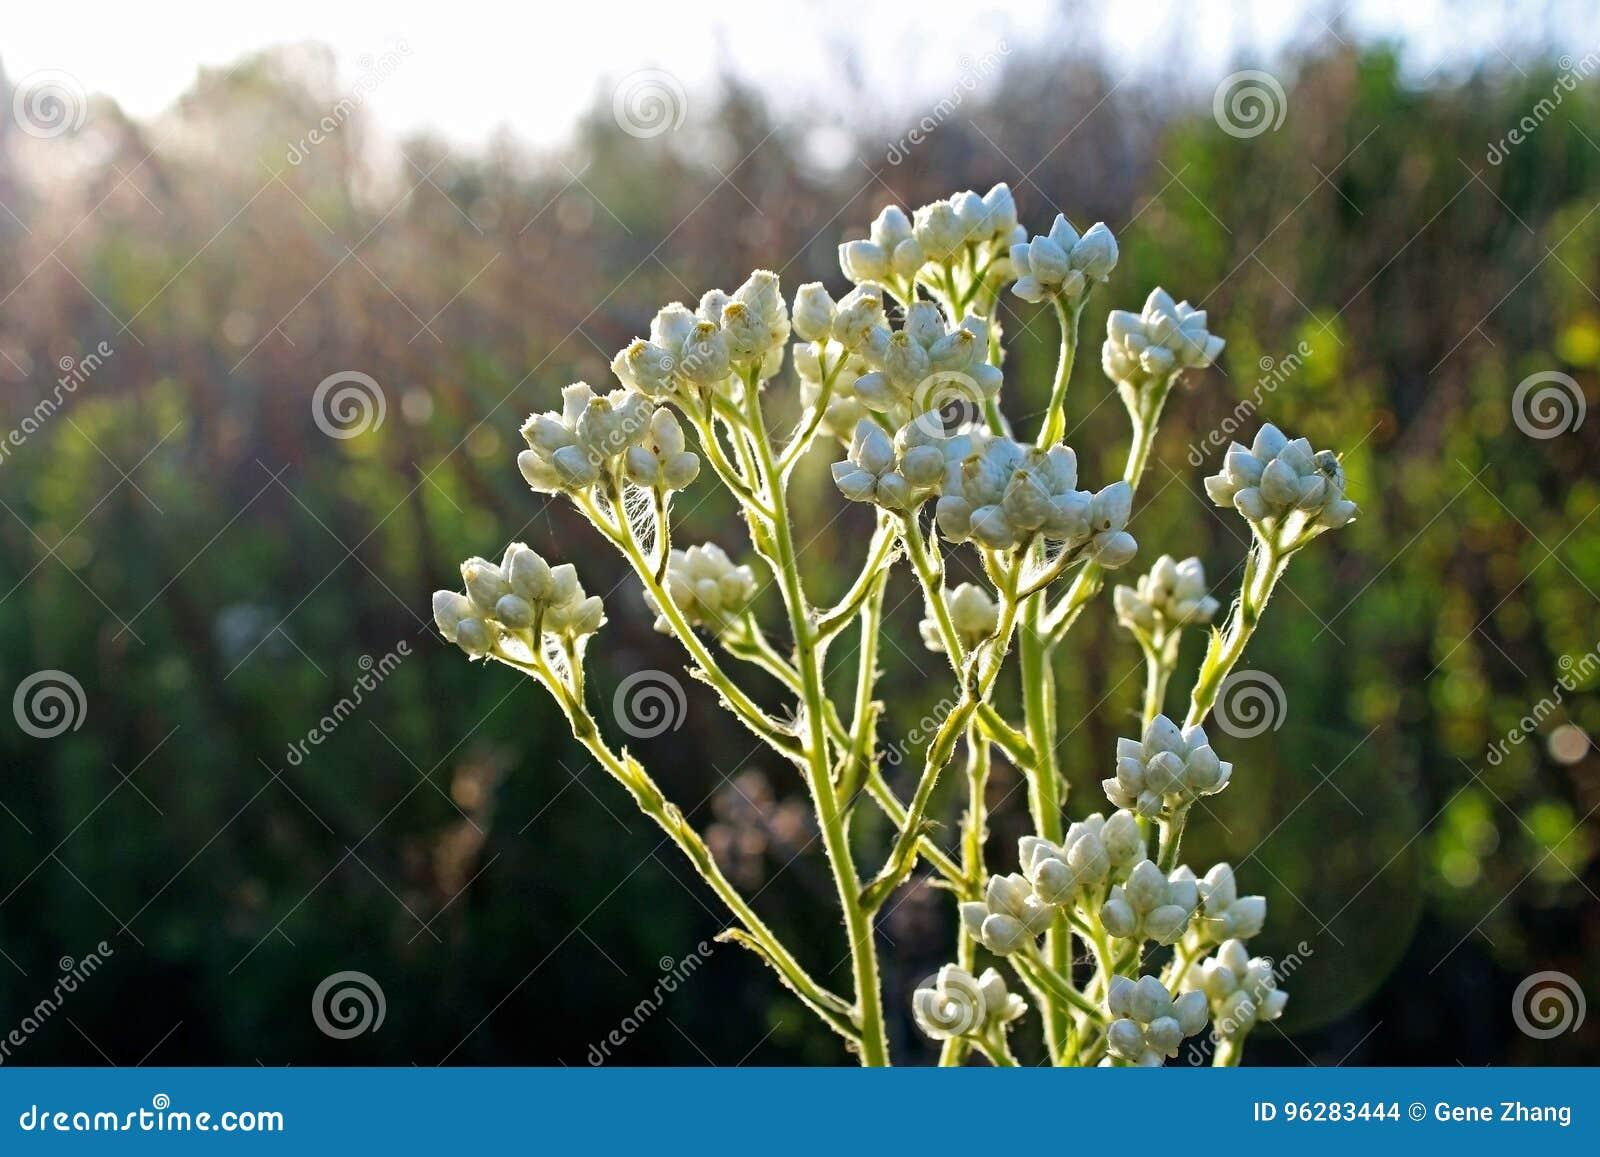 Pearly everlasting flowers in bloom stock photo image of spring pearly everlasting flowers are in full bloom under blue sky in 2017 california super bloom izmirmasajfo